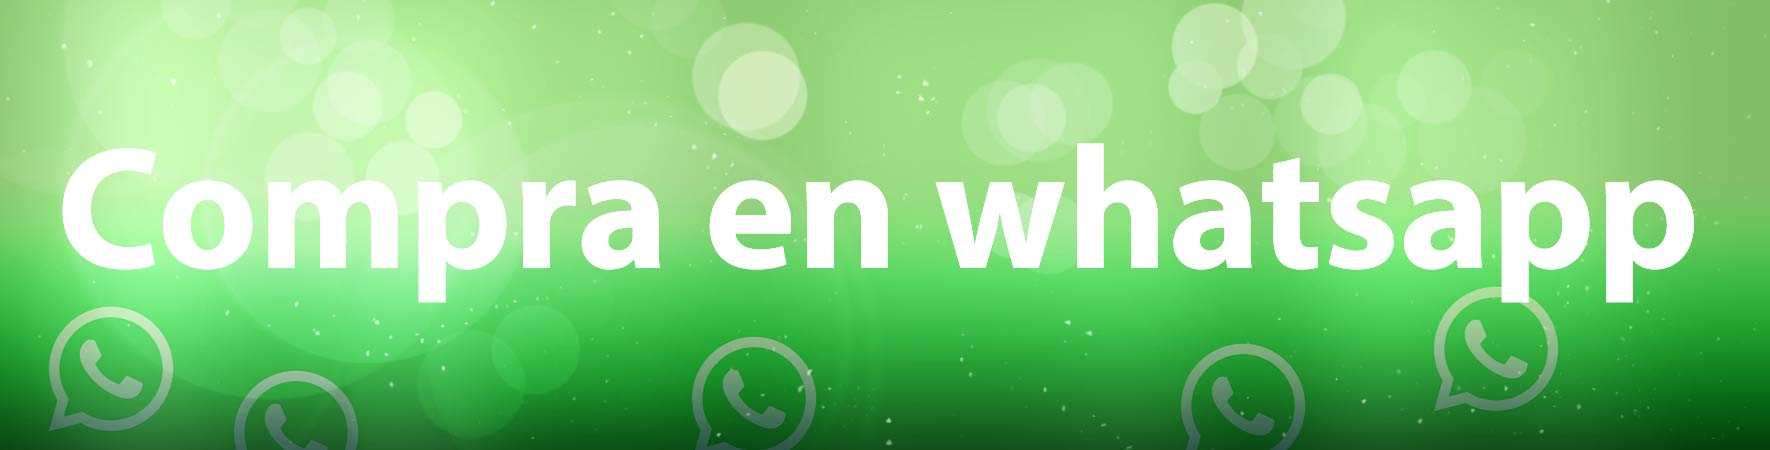 Banner compra whatsapp